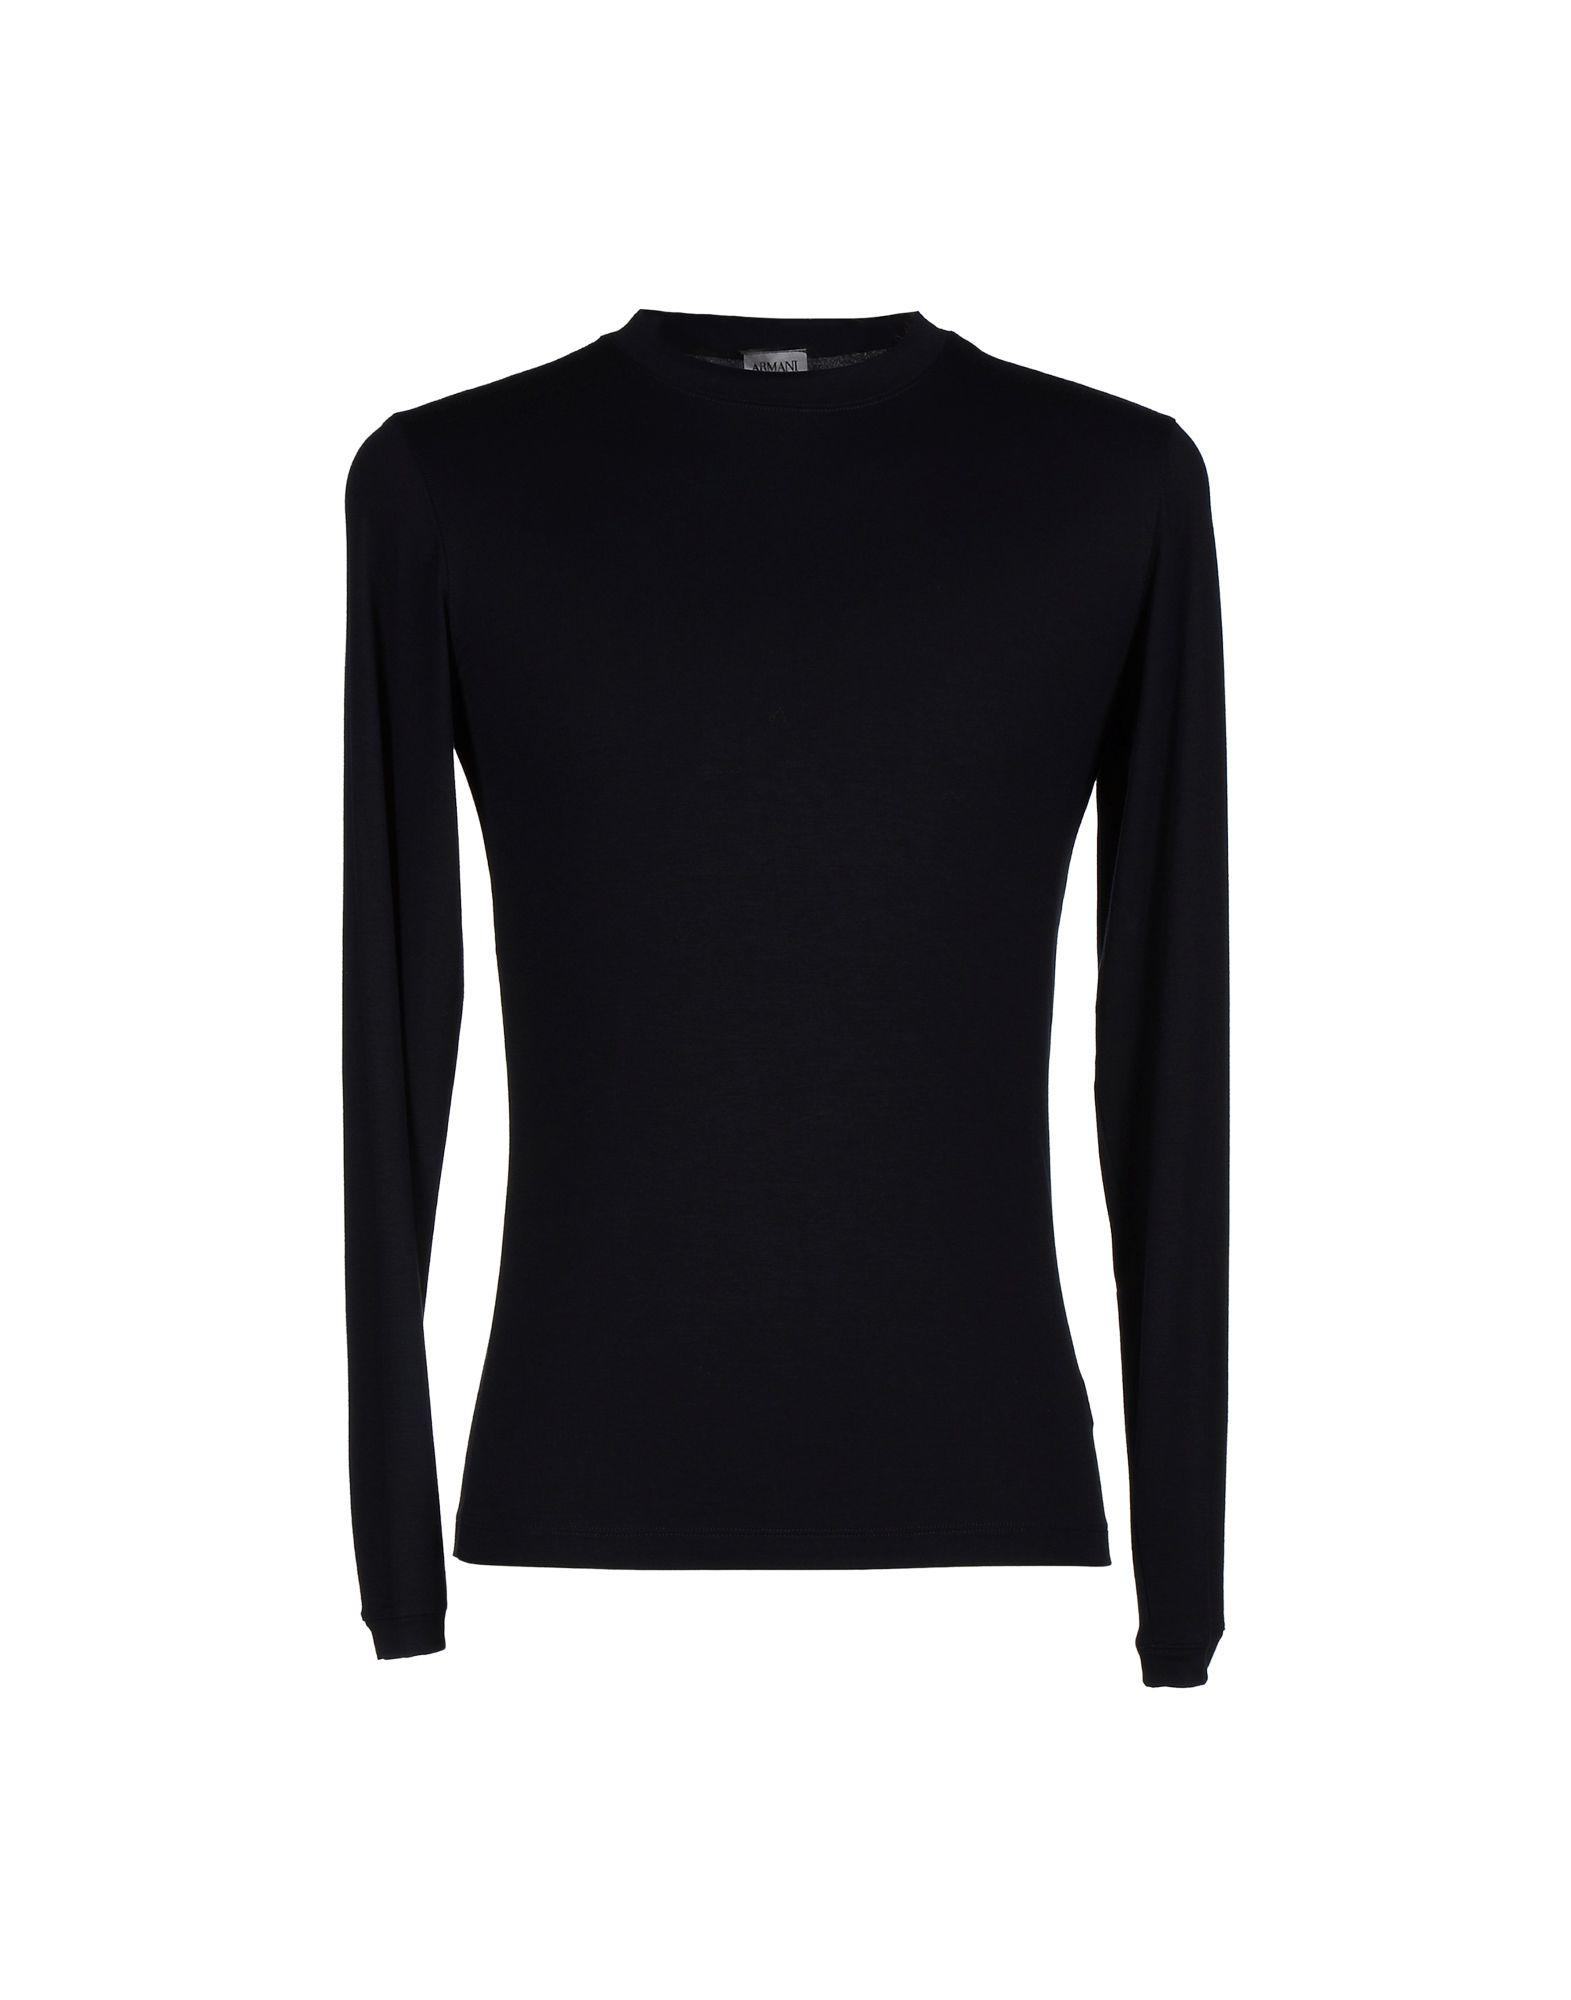 Armani t shirt in black for men lyst for Black armani t shirt